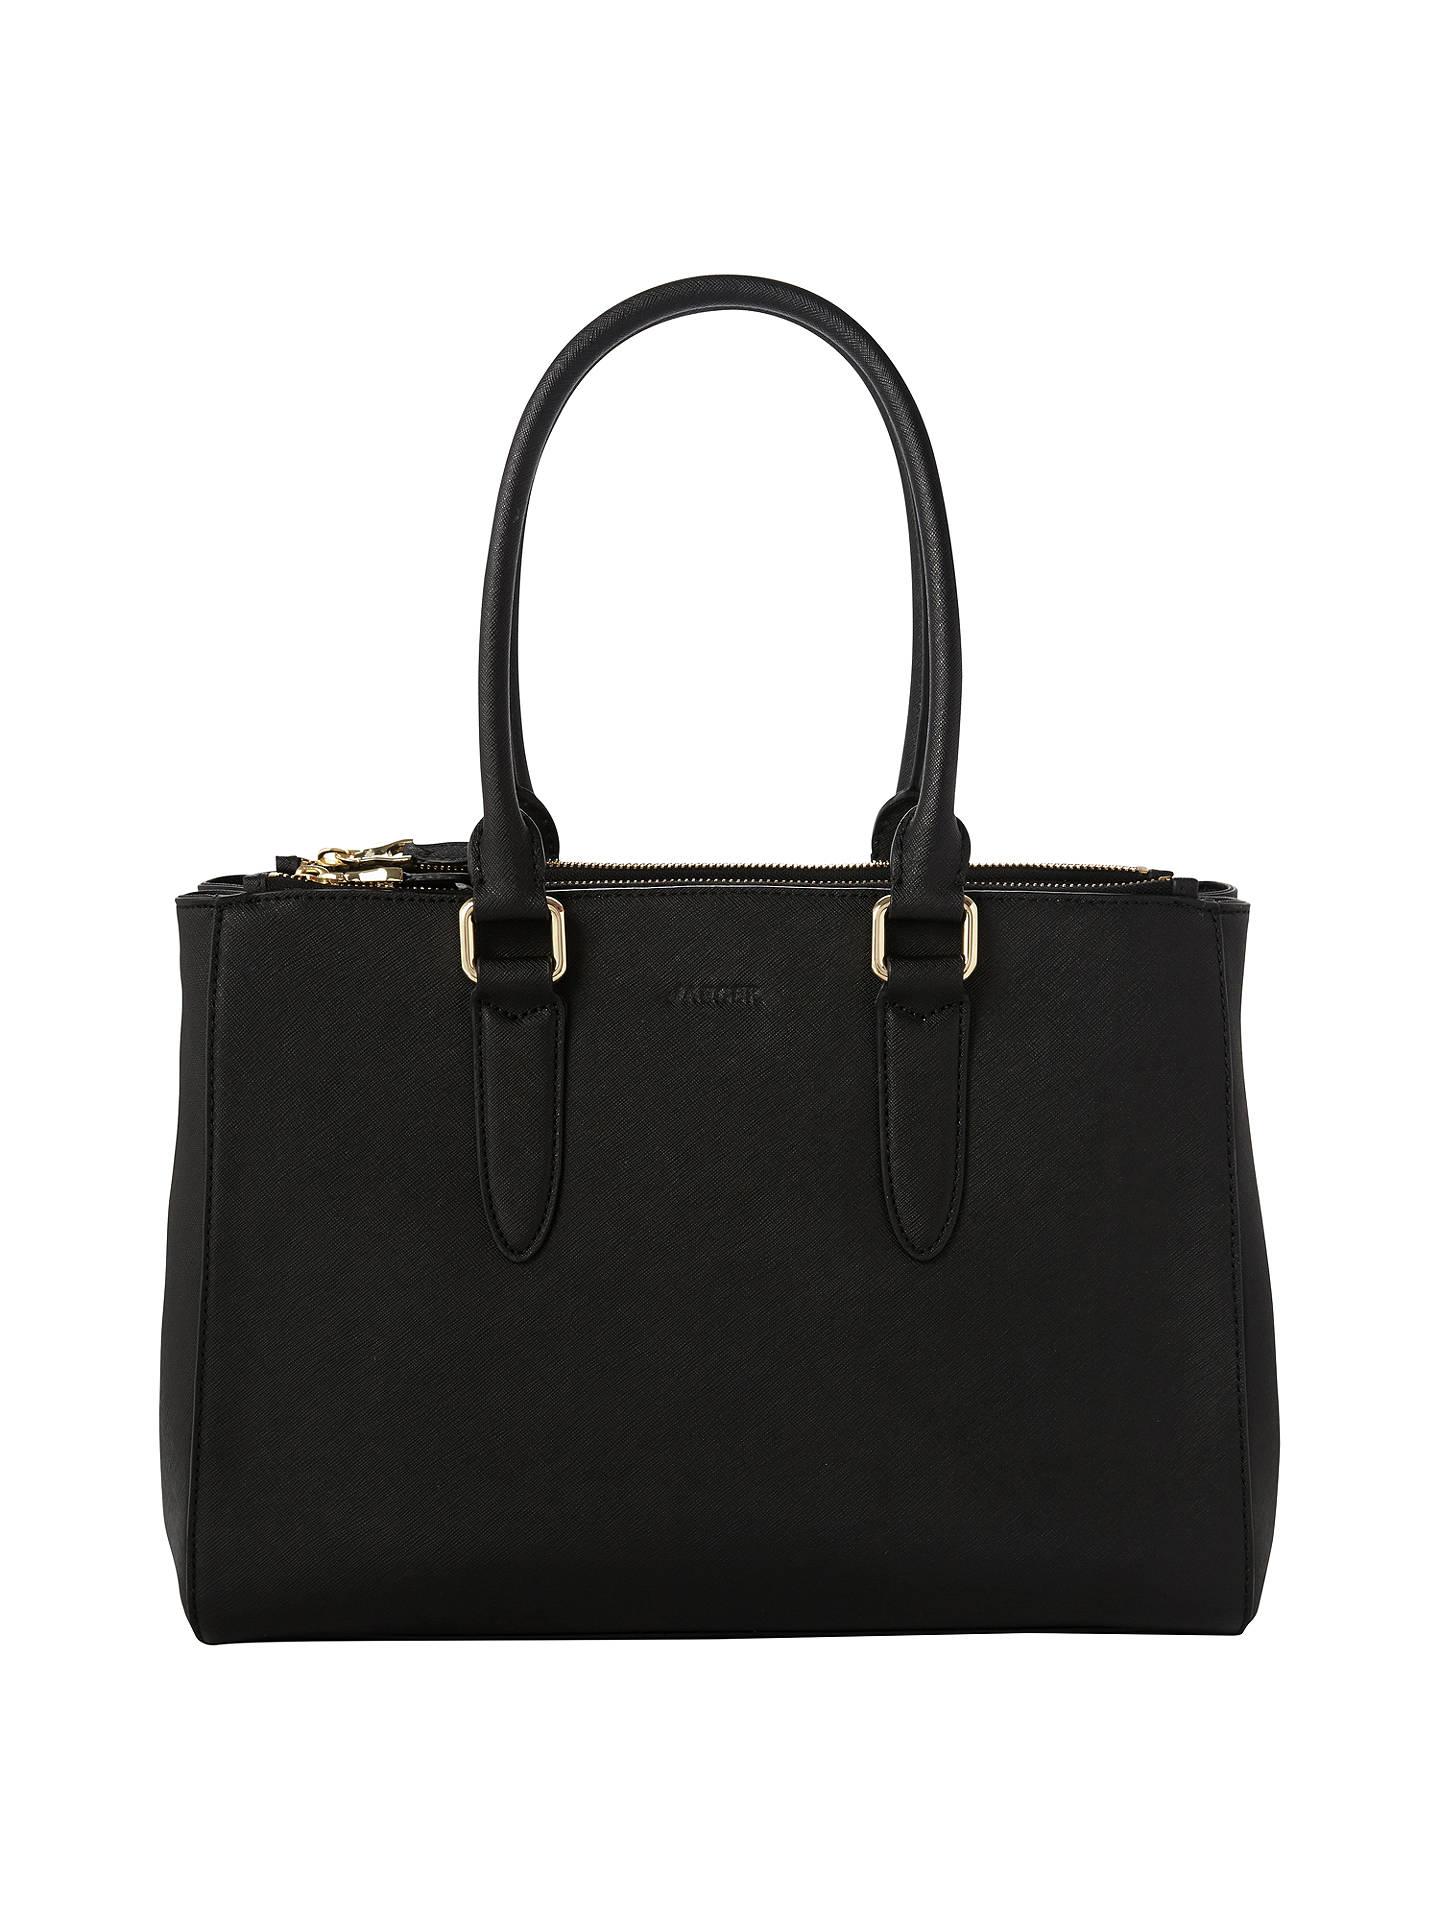 Jaeger Marshall Leather Tote Bag Black Online At Johnlewis